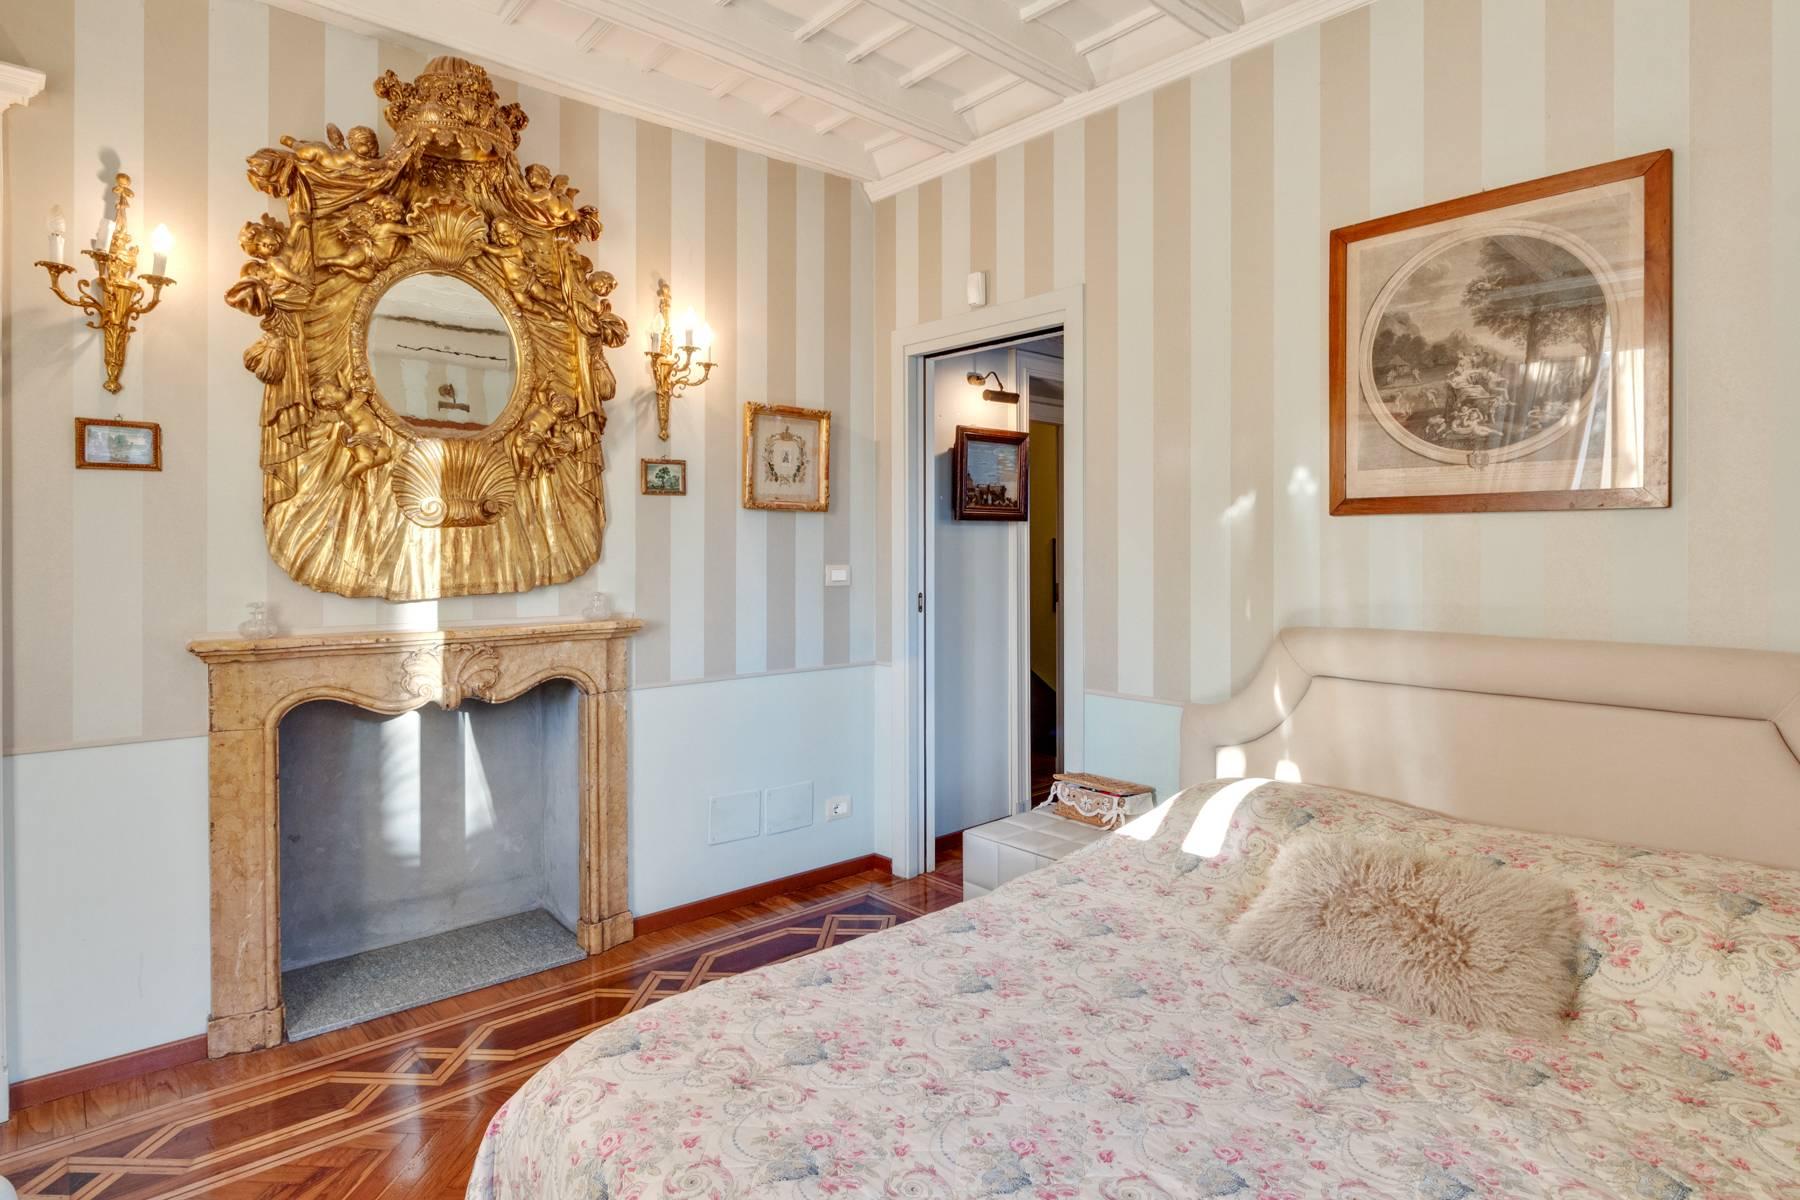 Casa indipendente in Vendita a Torino: 5 locali, 270 mq - Foto 17